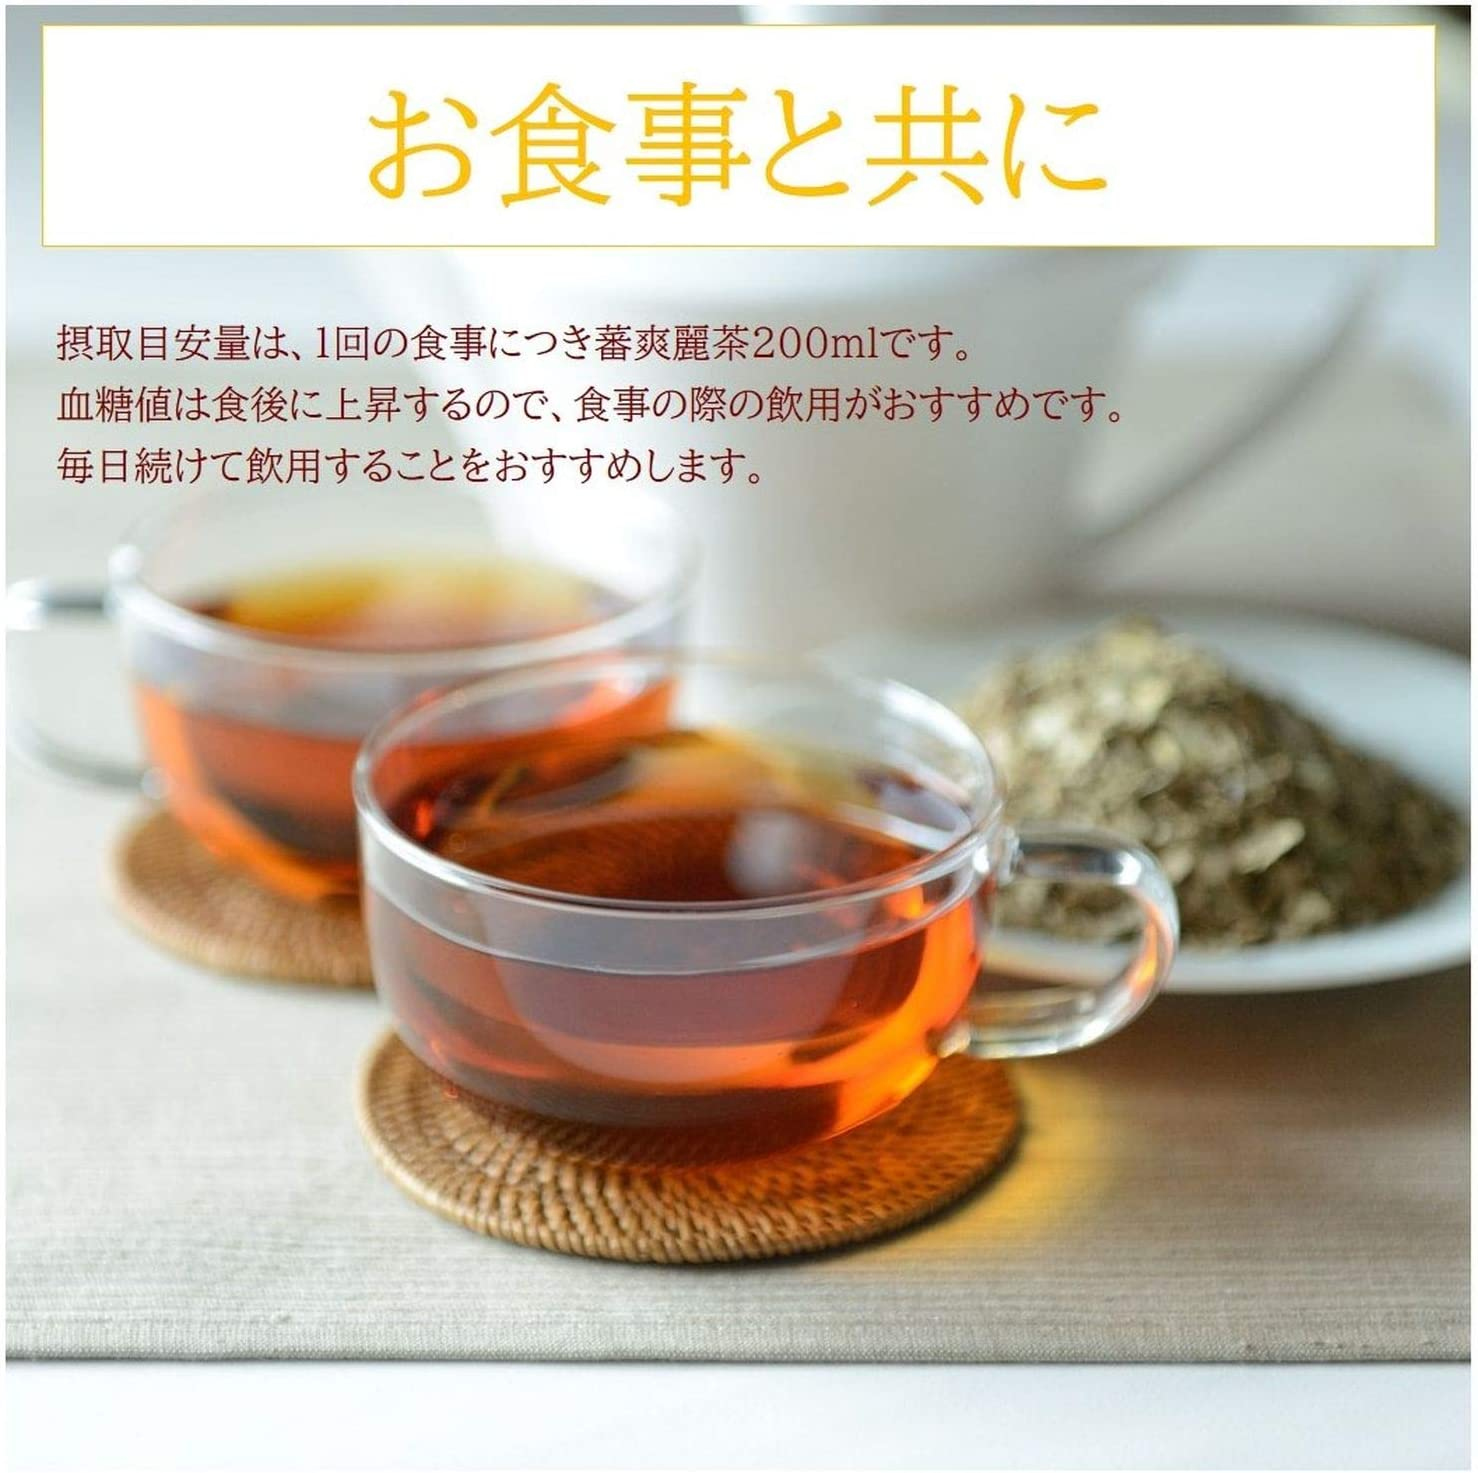 茶 効果 爽麗 蕃